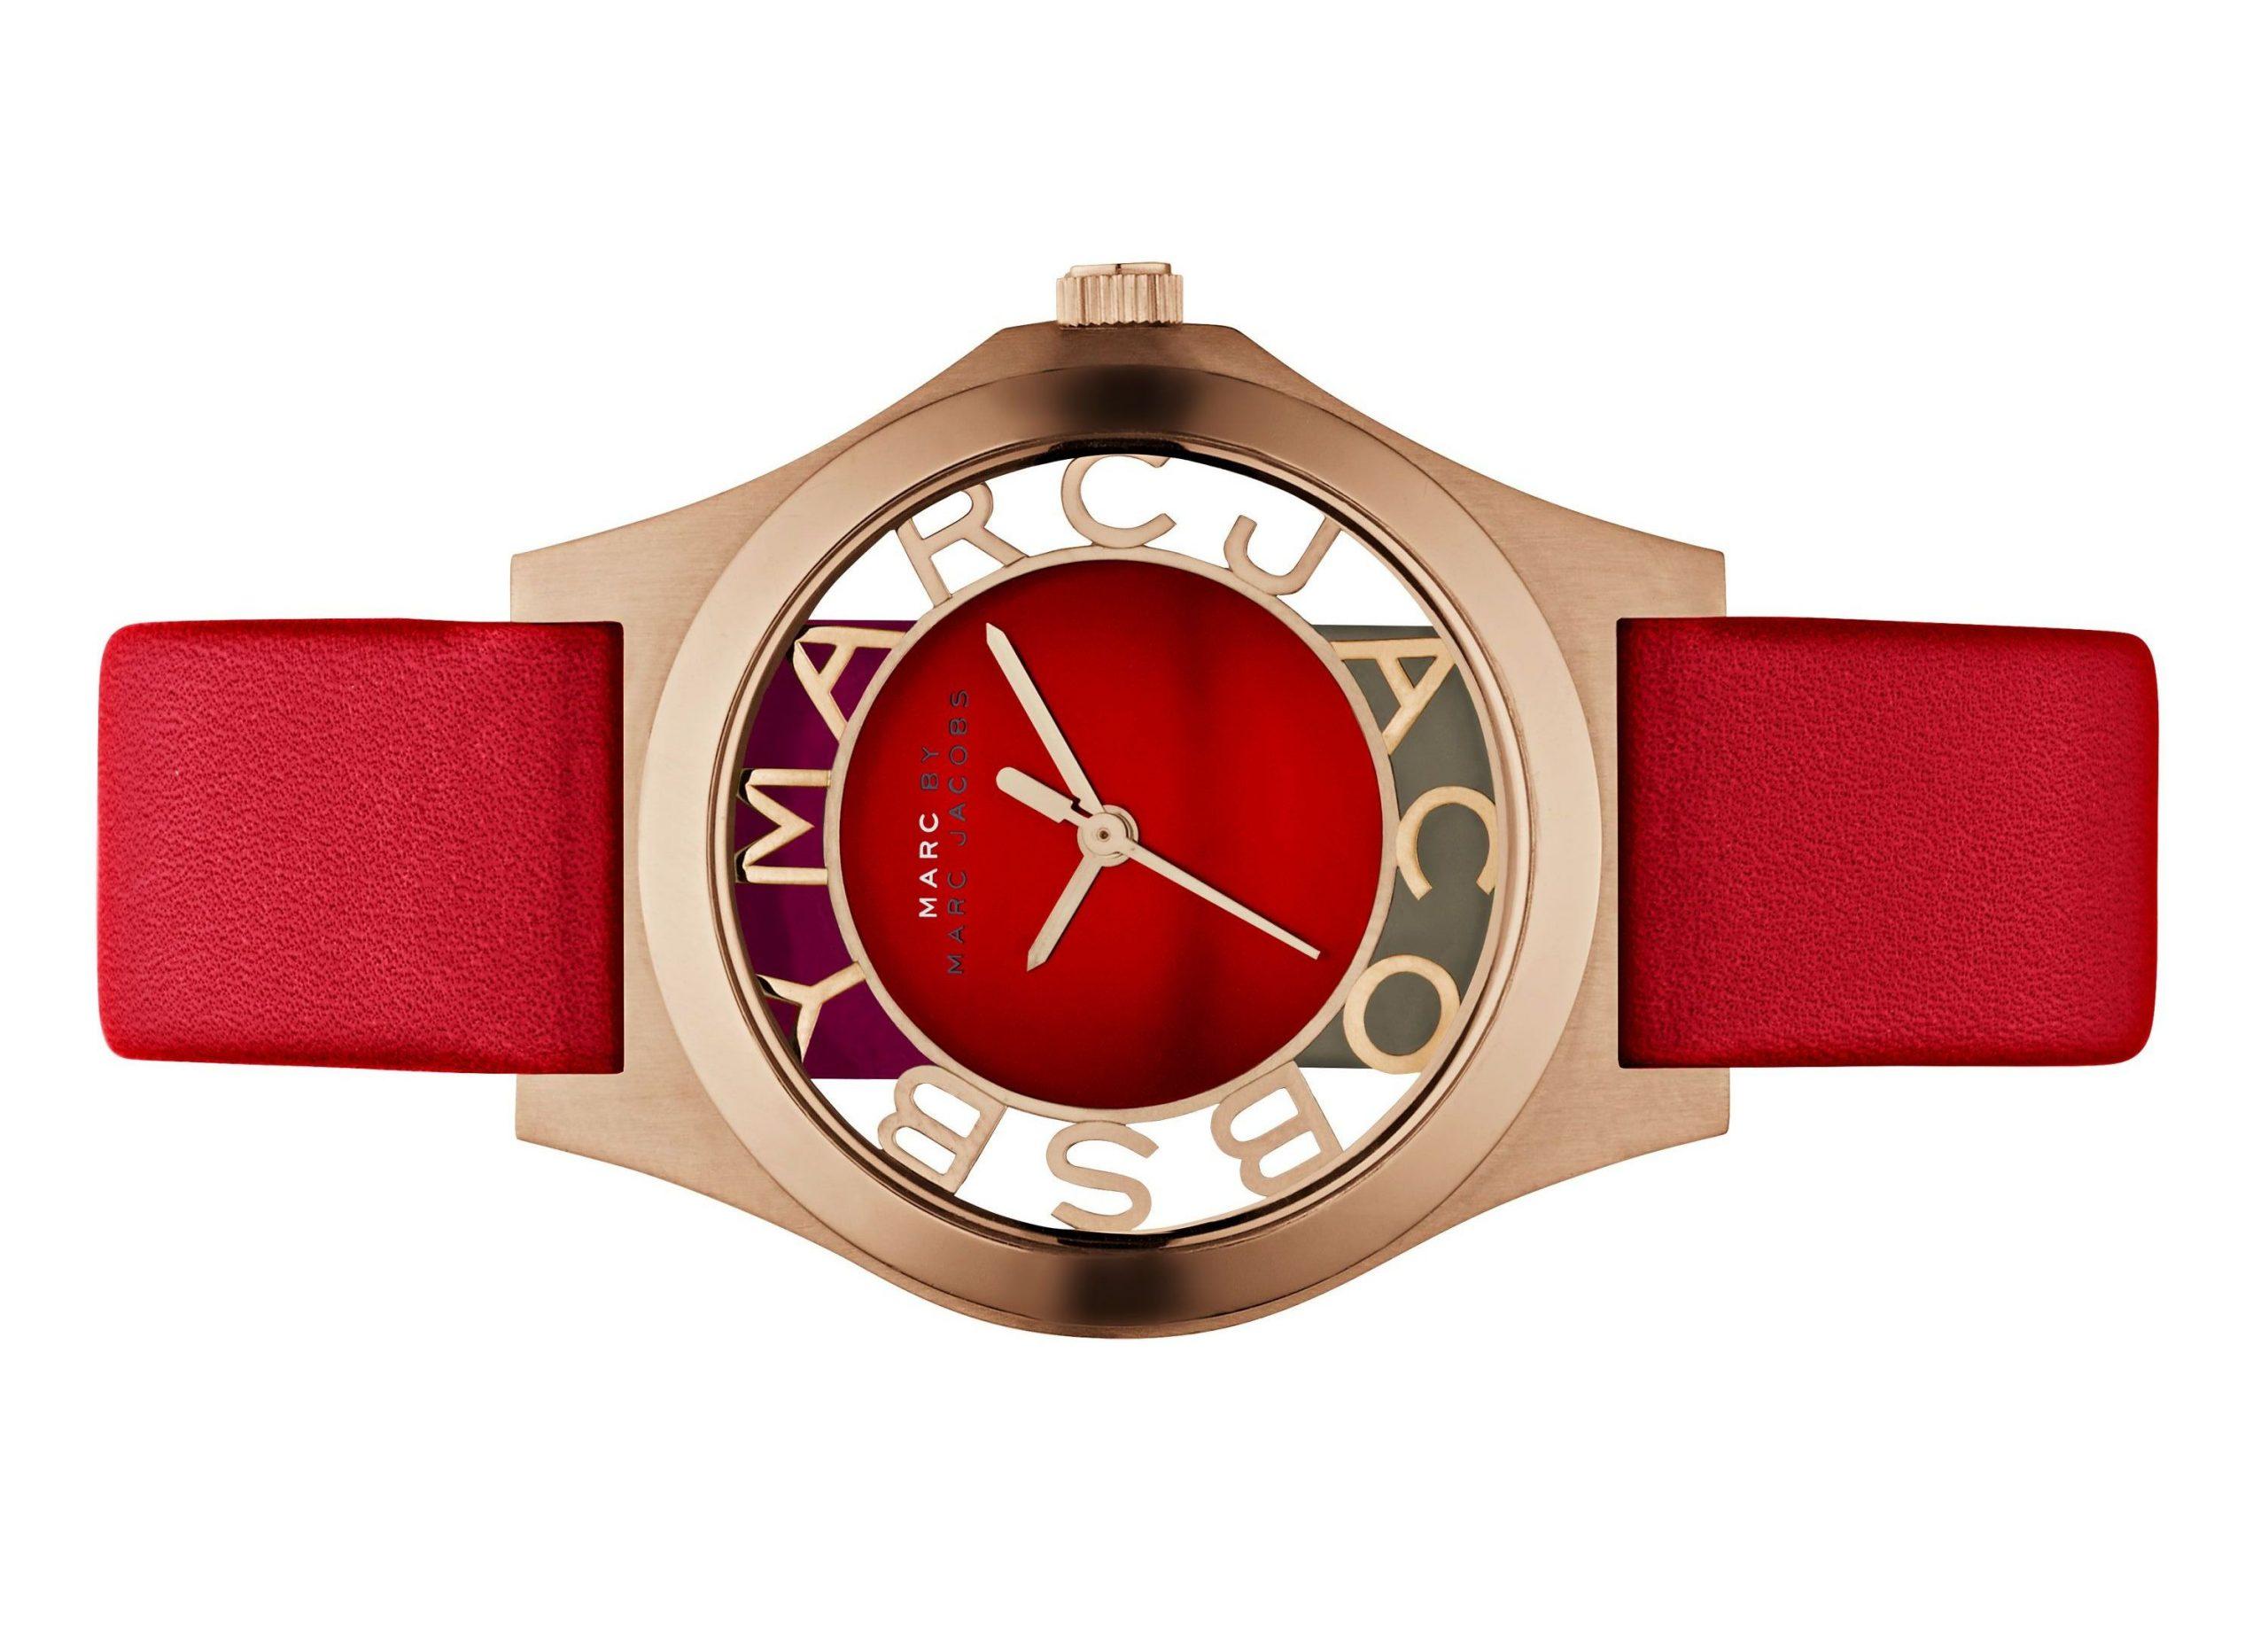 Marc Red, MBM1338, 199 euros, da Marc Jacobs